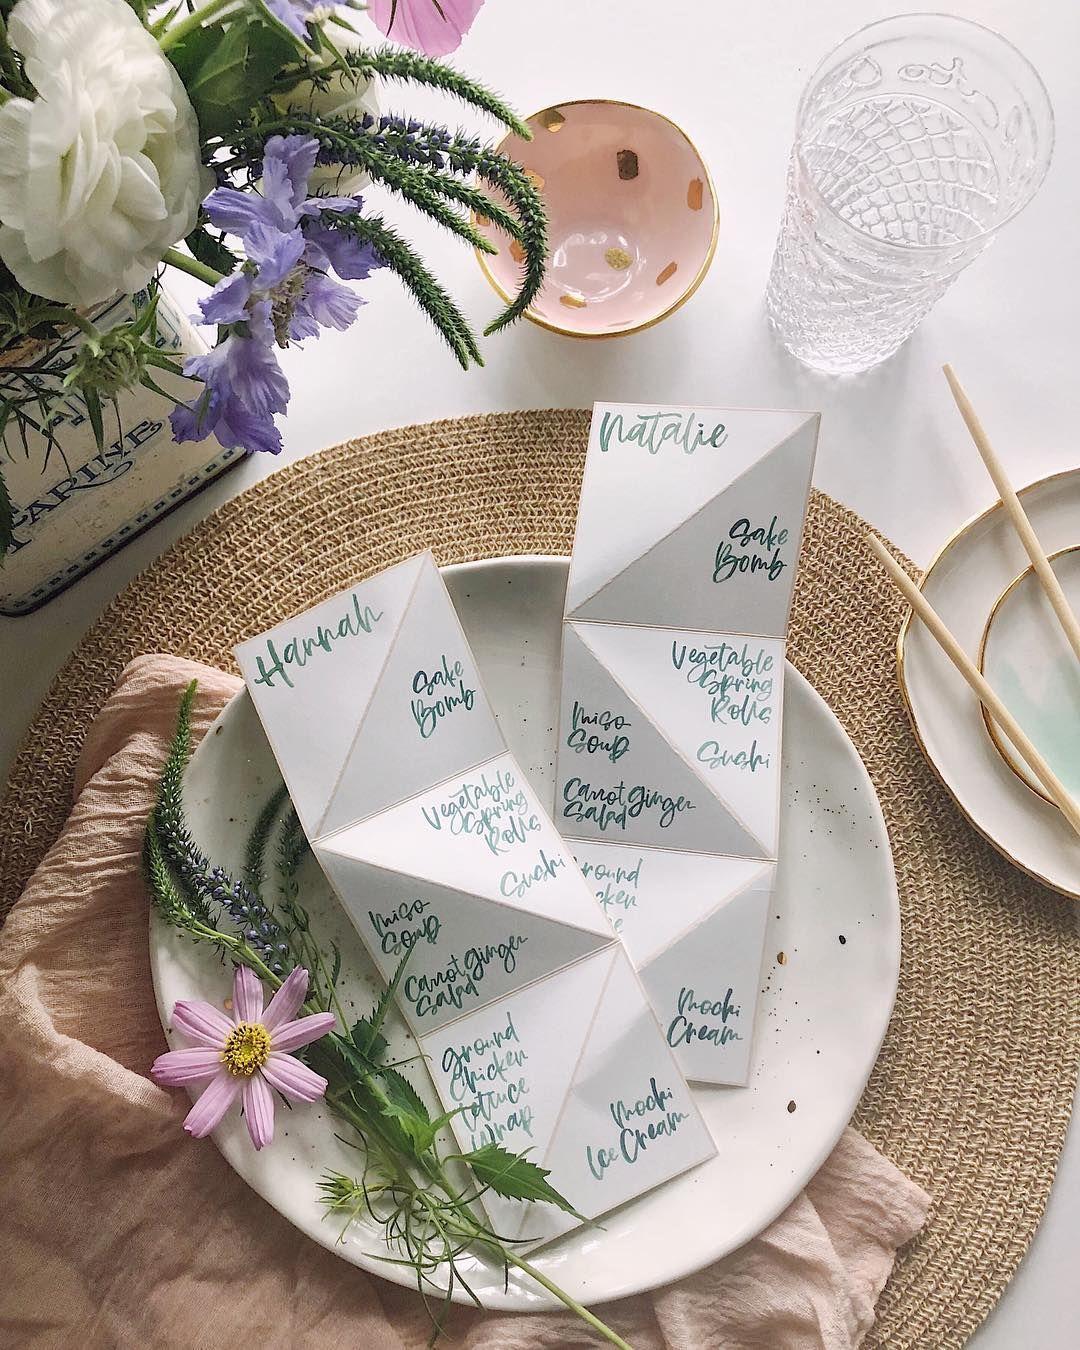 Origami - Sushi-Restaurant - La Marsa - 31 Bewertungen - 254 Fotos ...   1350x1080